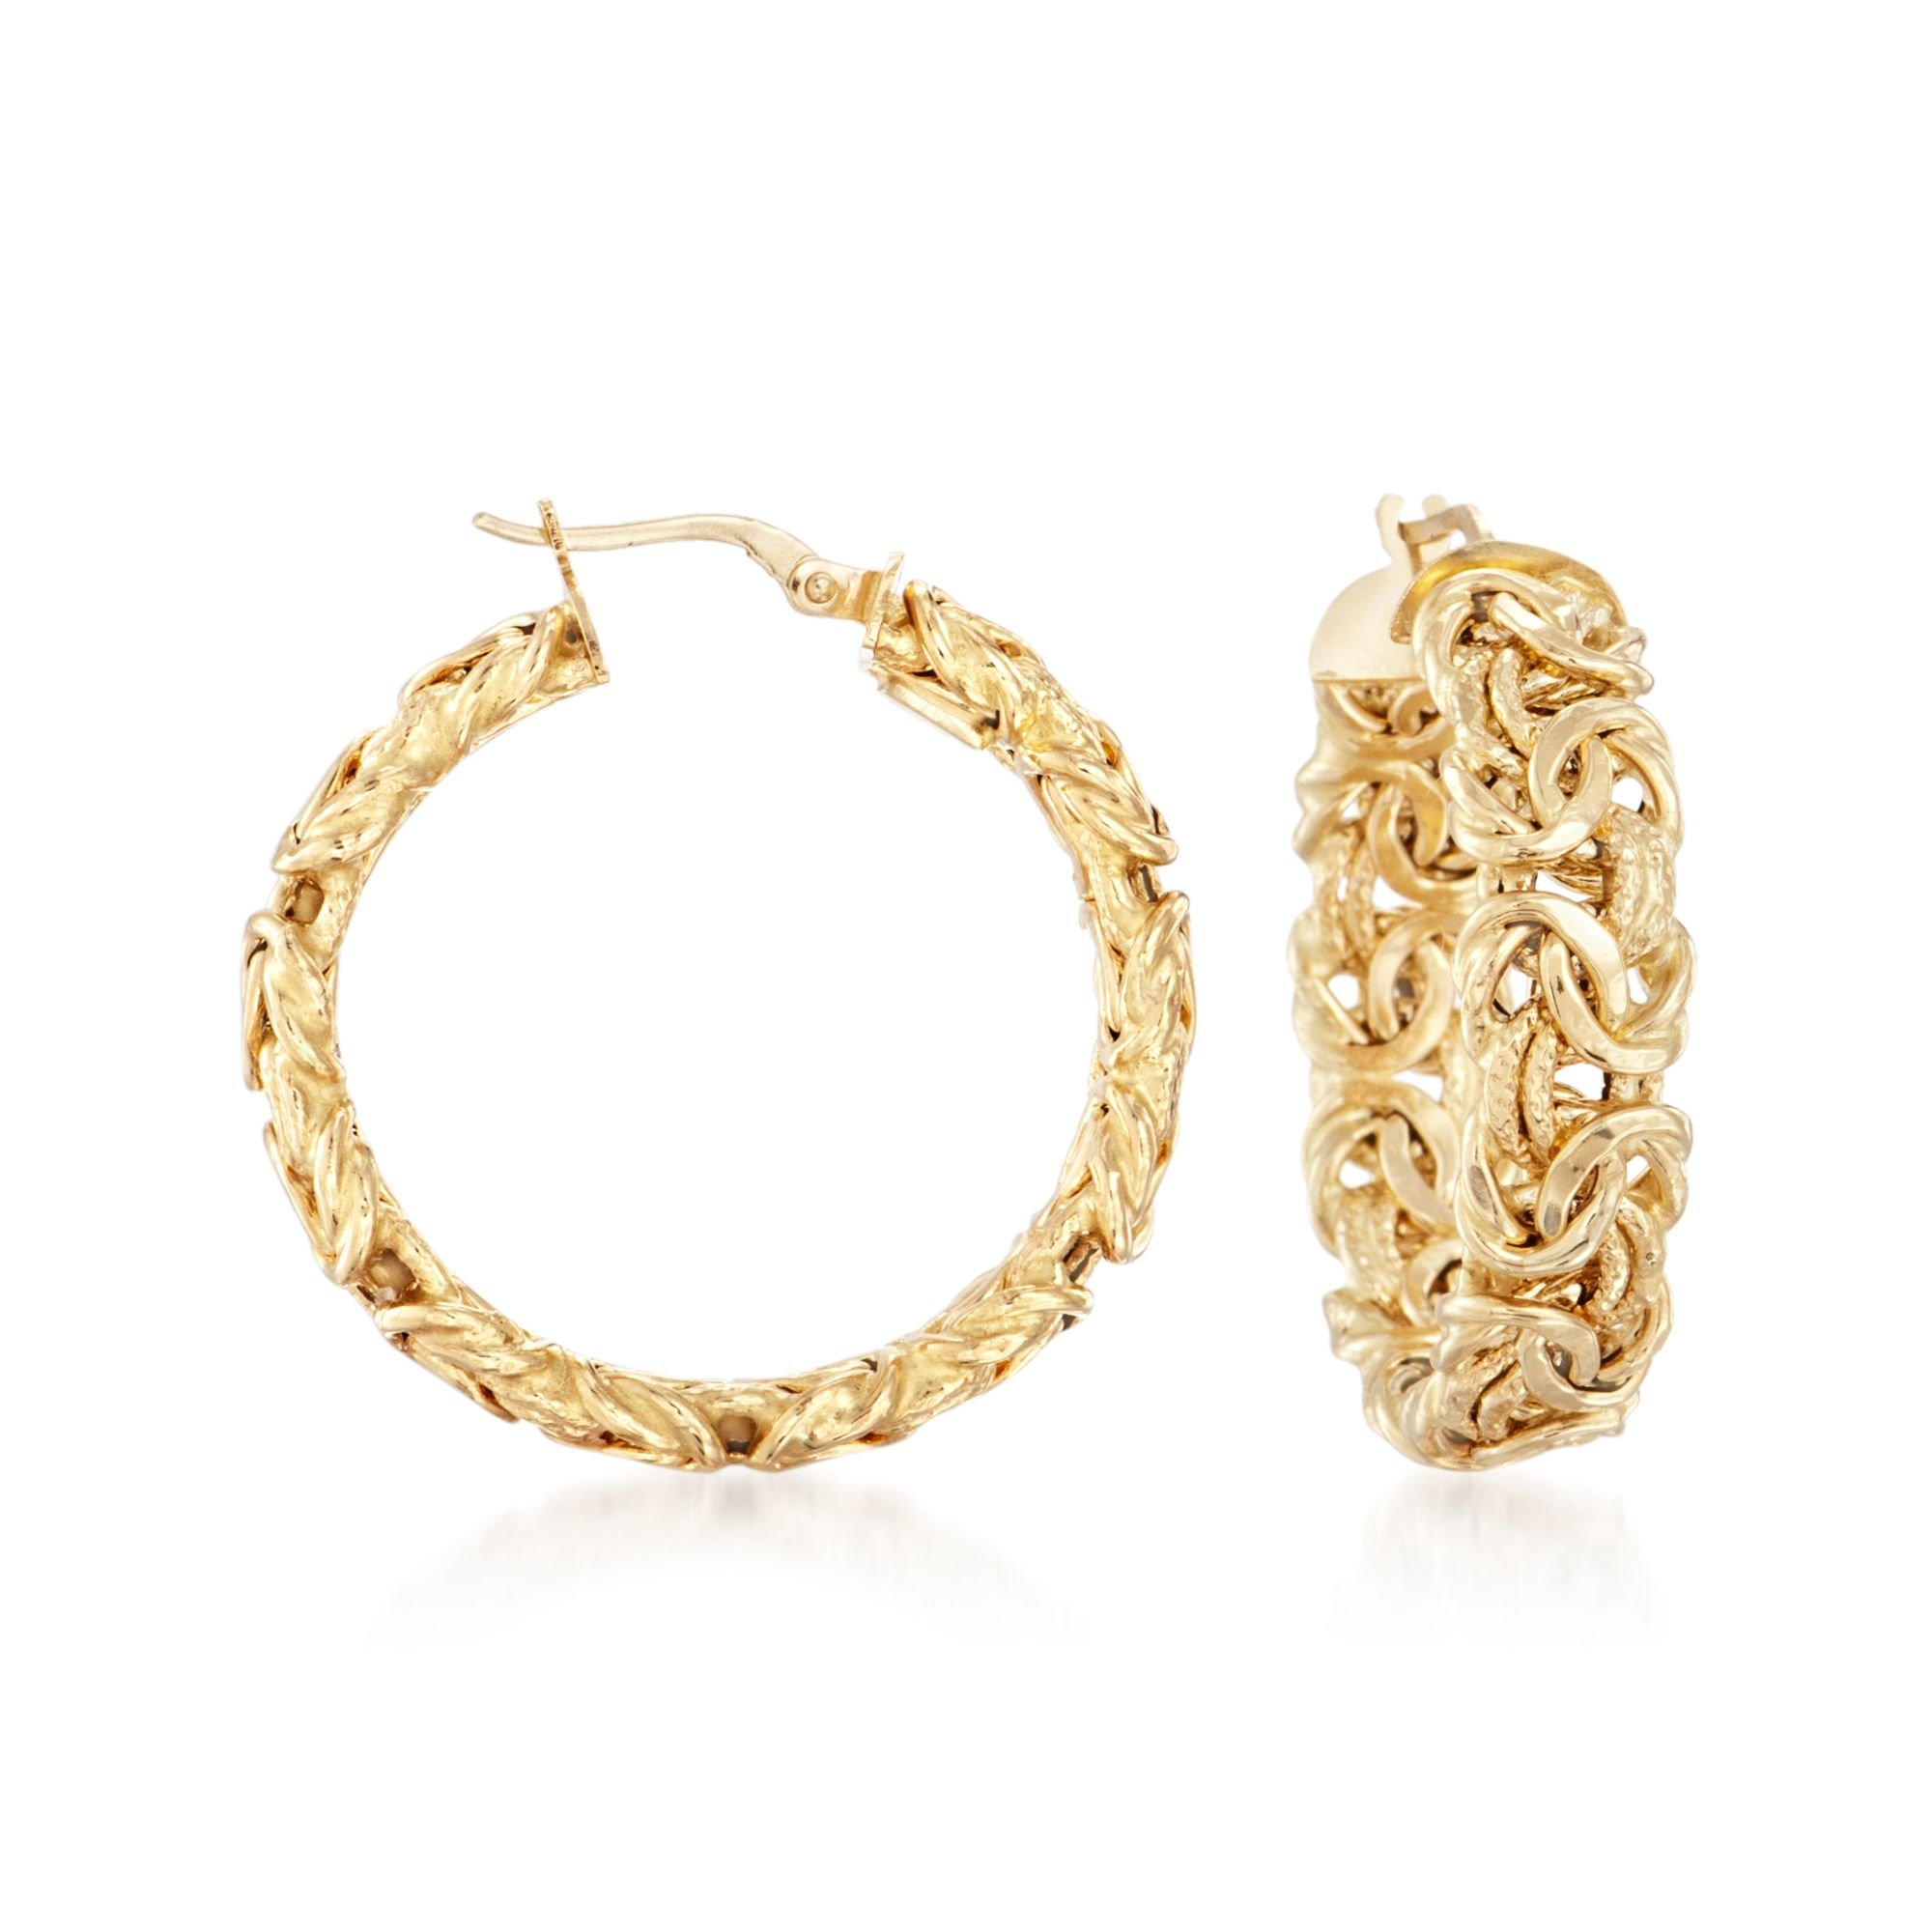 Ross-Simons Italian 18kt Yellow Gold Byzantine Hoop Earring